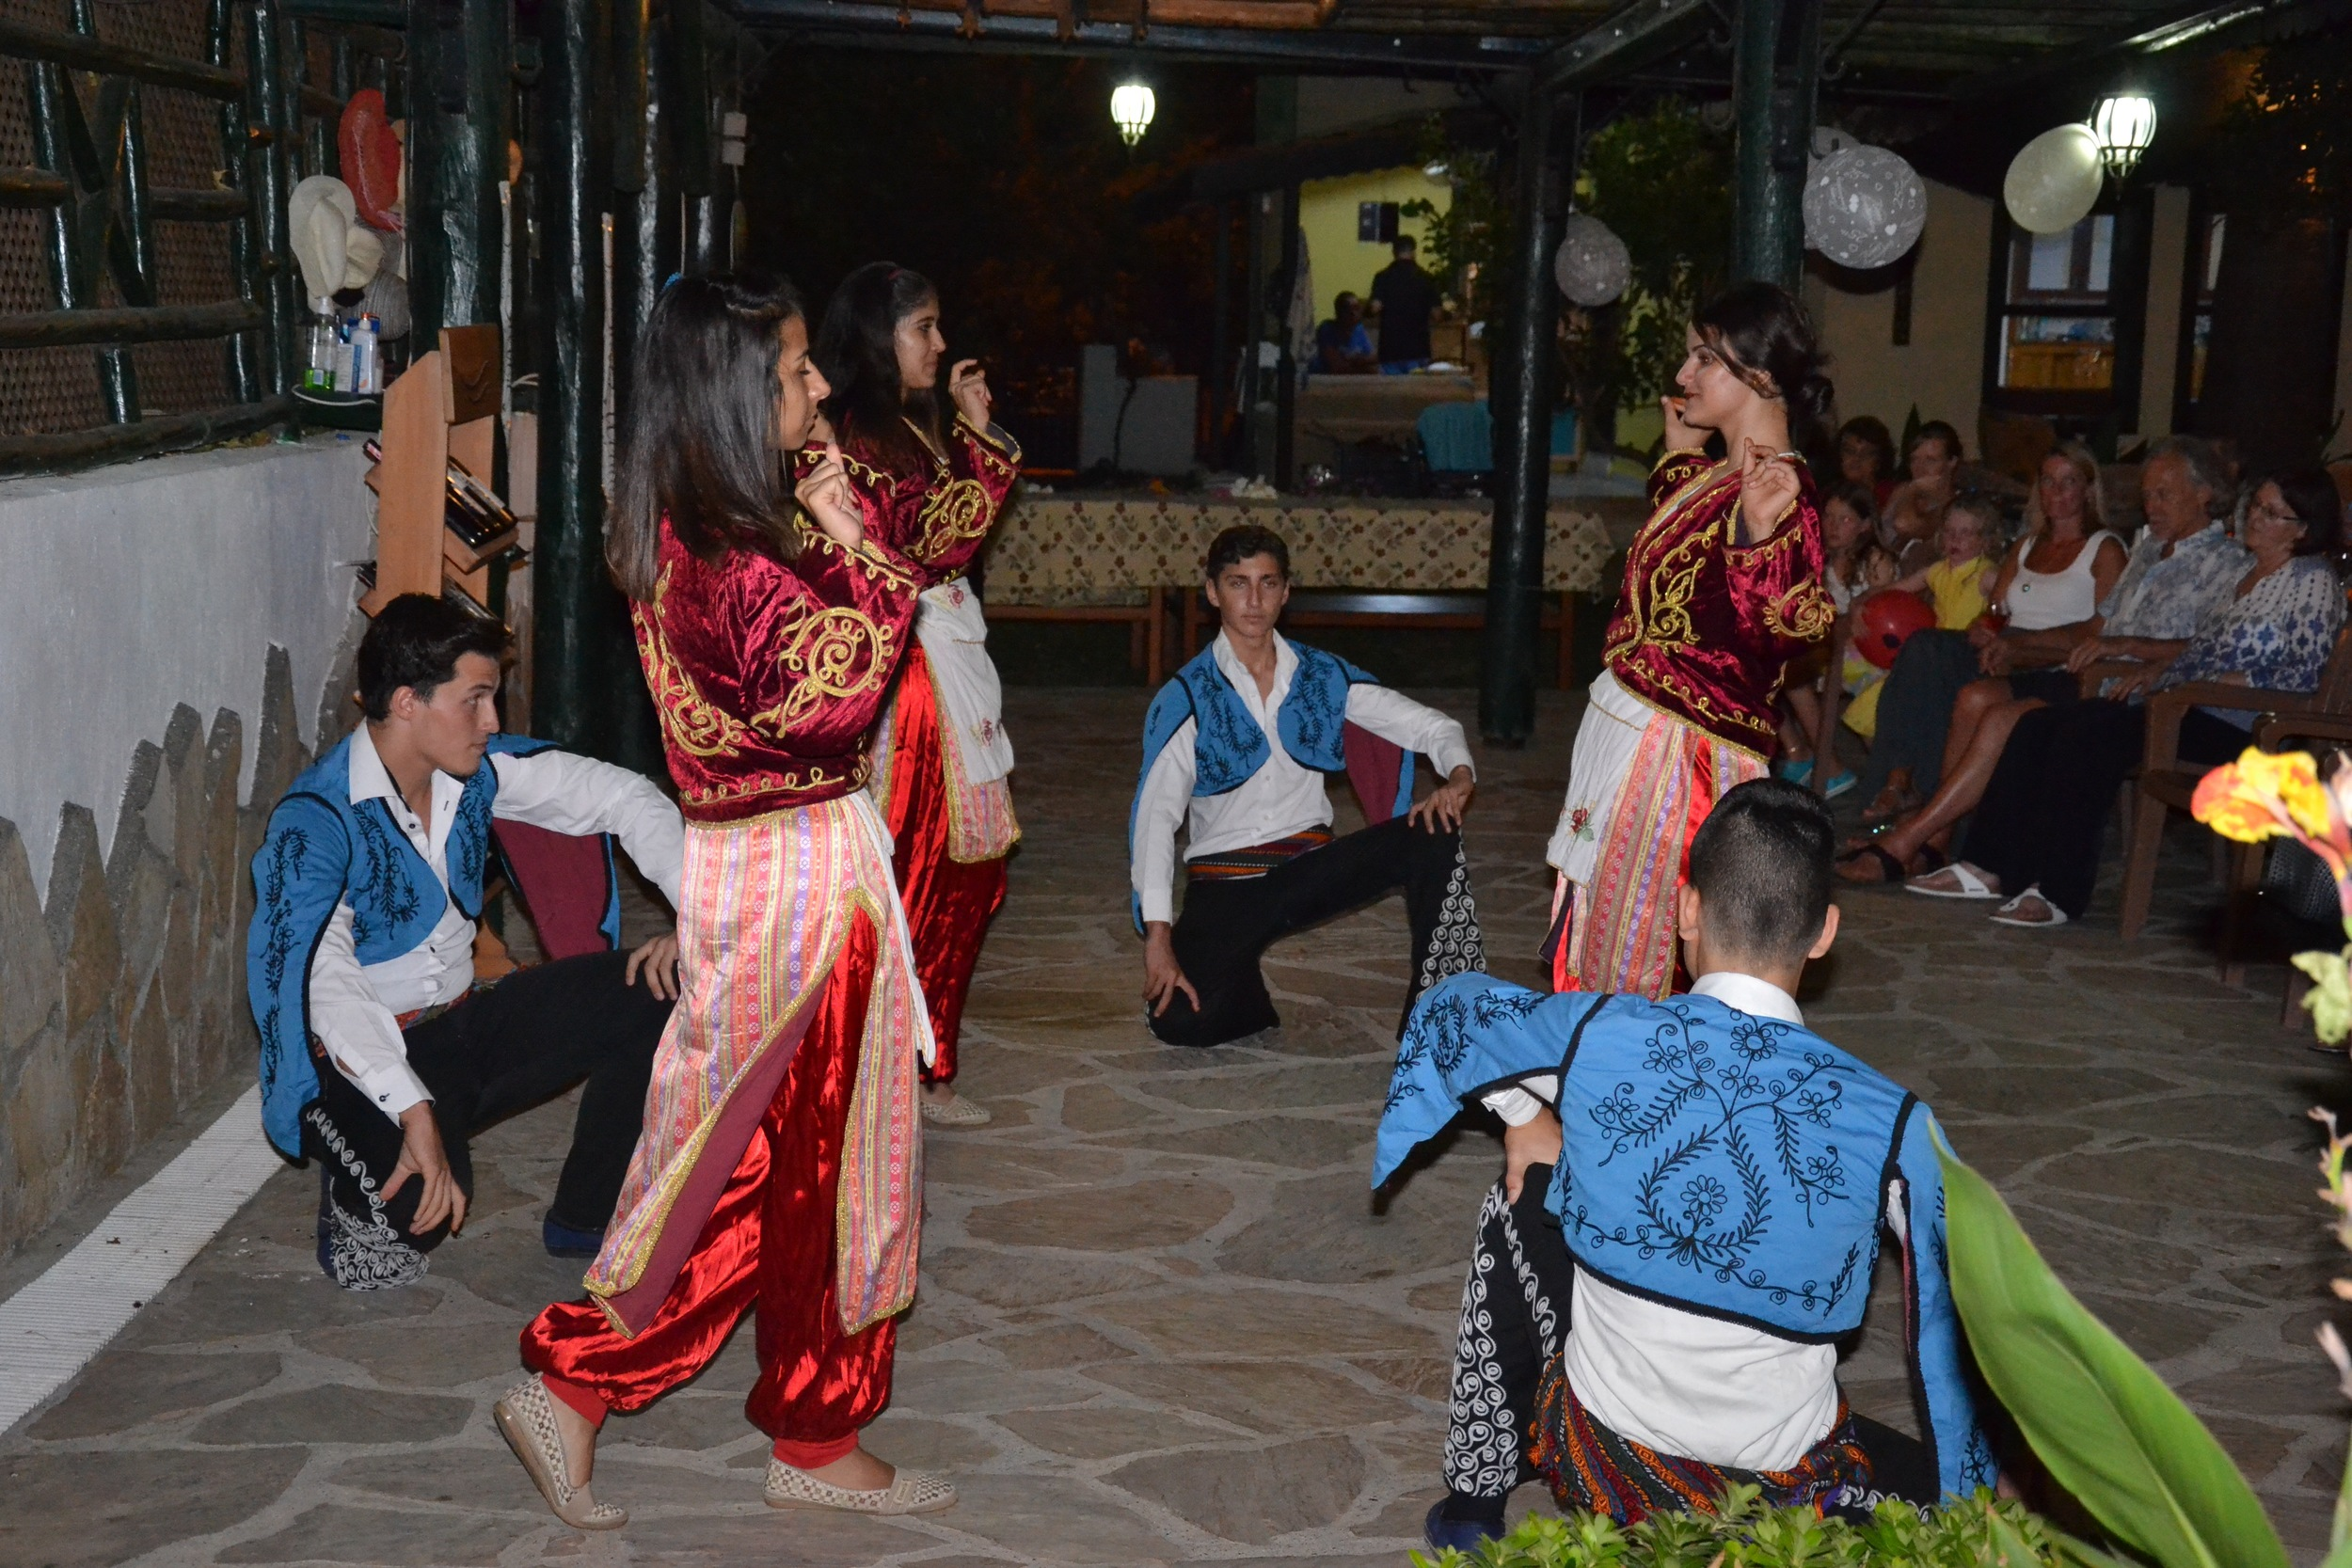 A bit of Turkish dancing